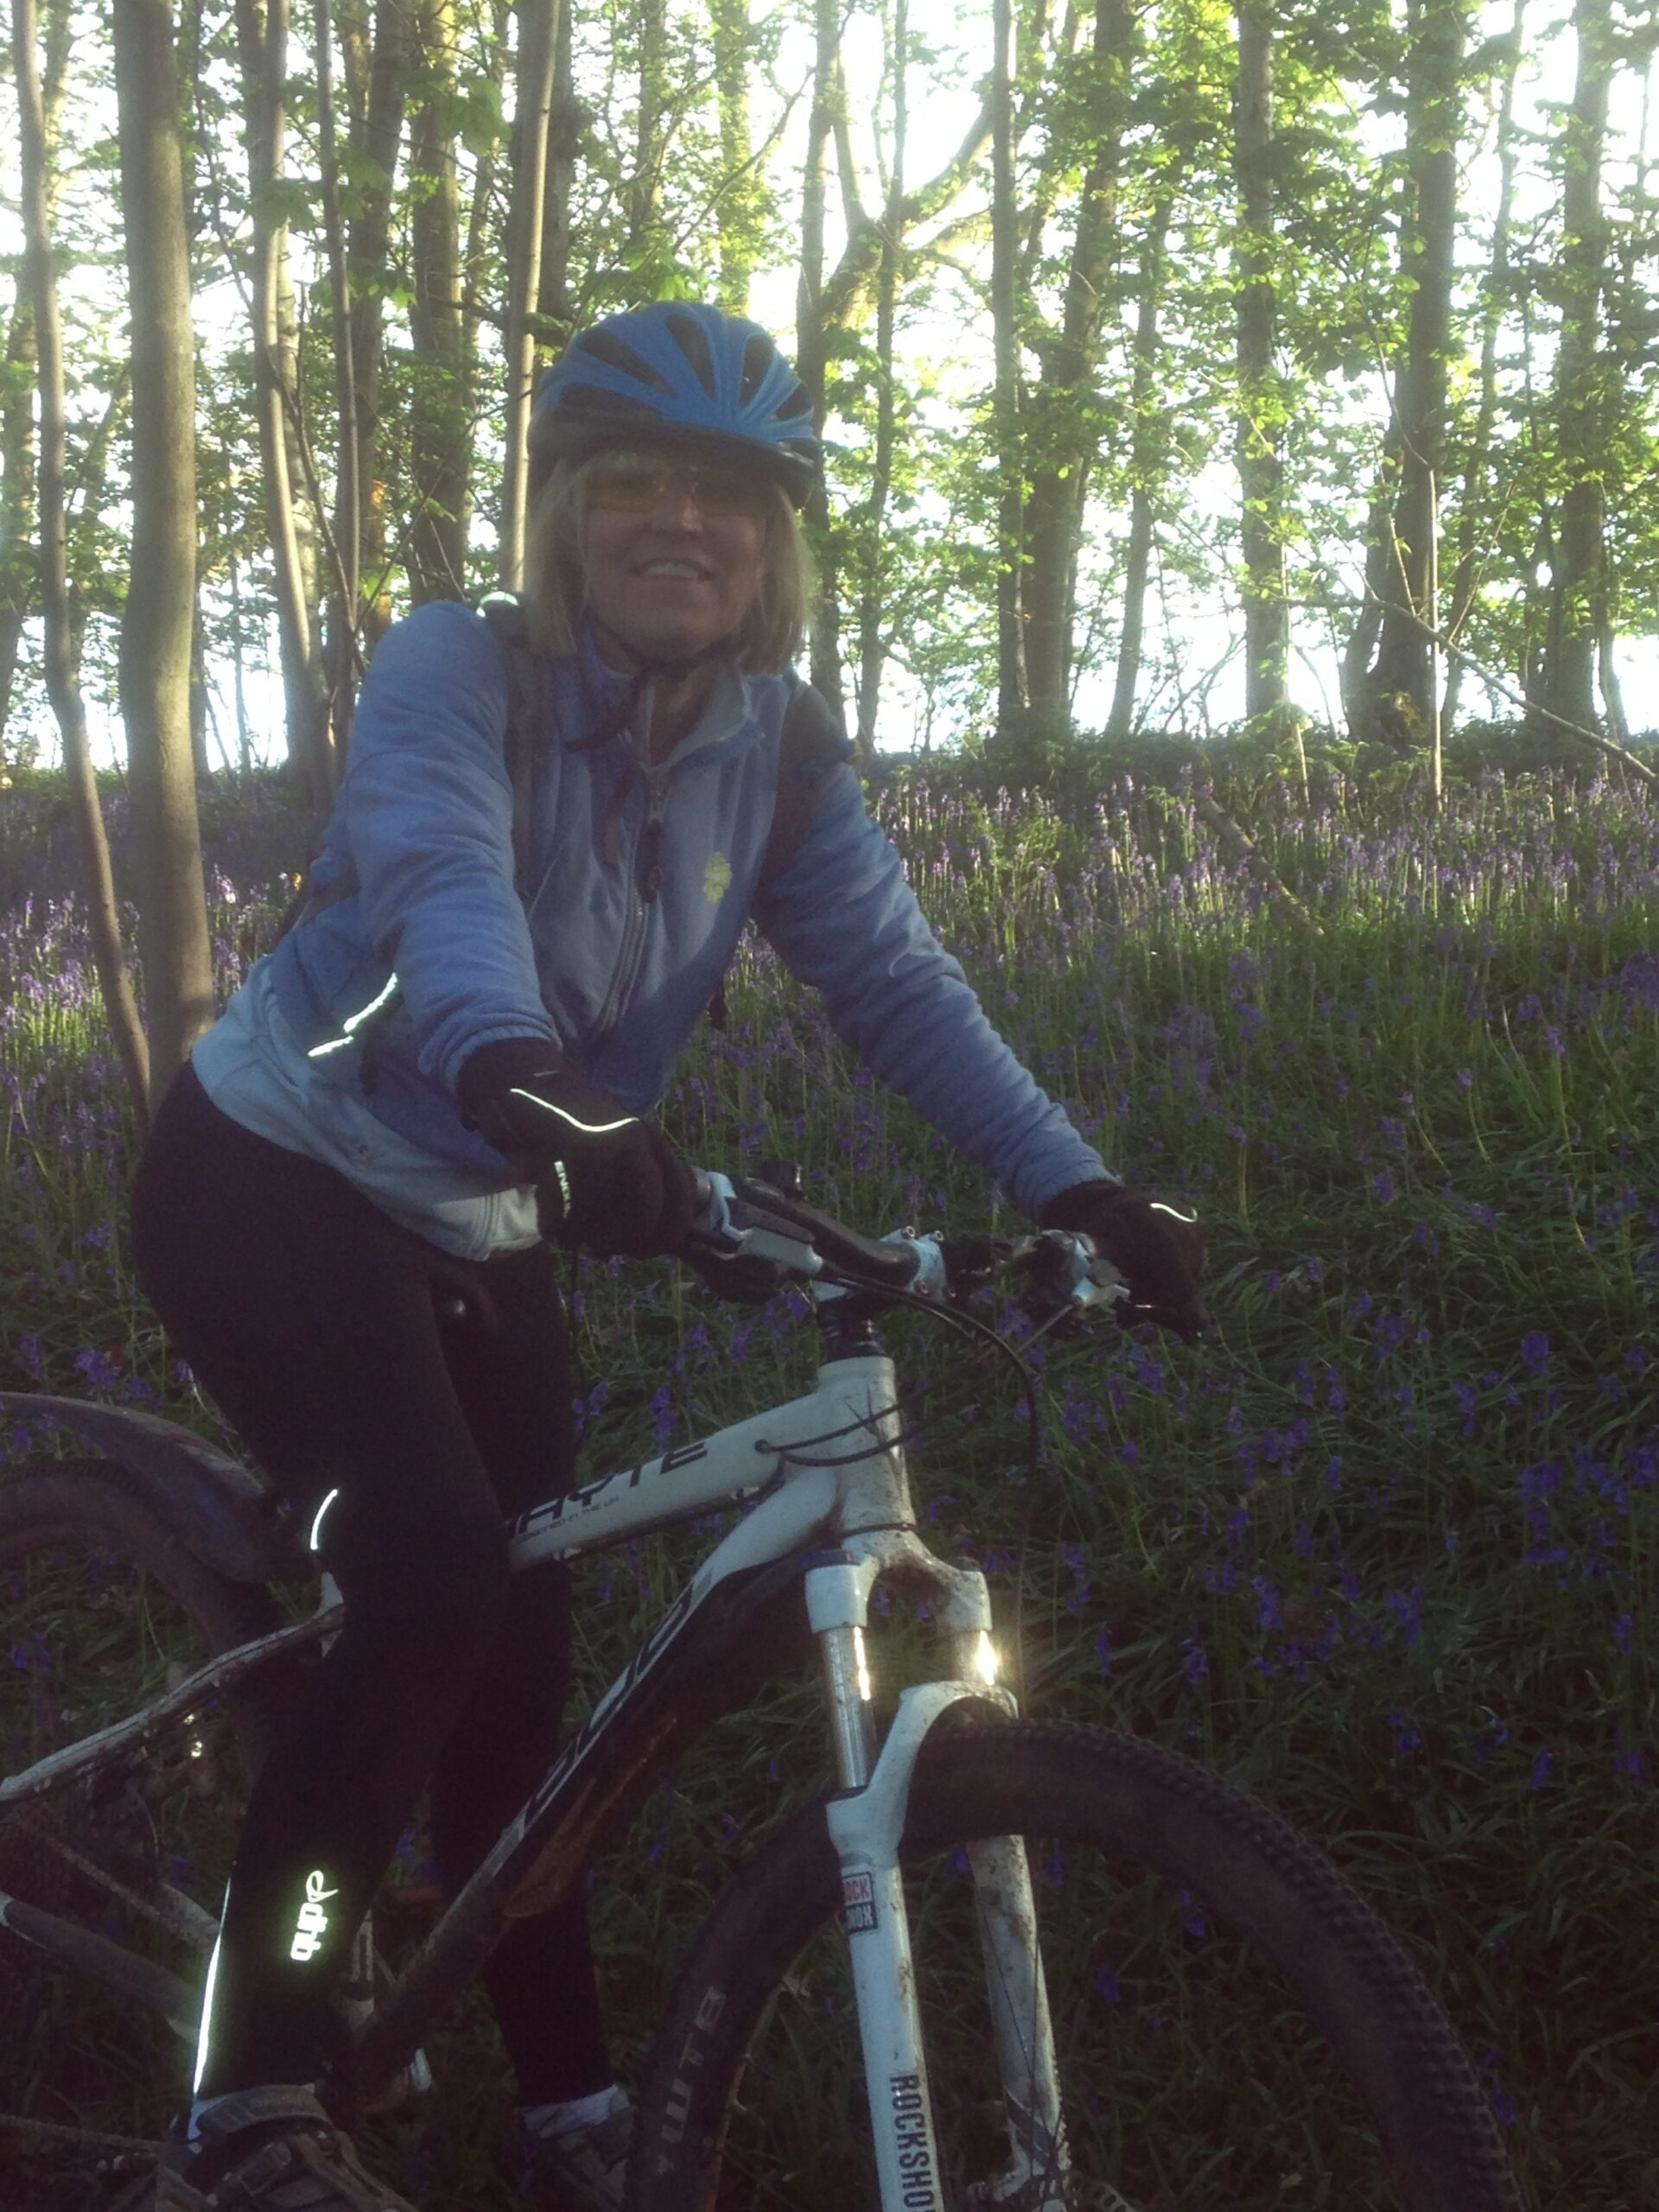 self care, selfcare, mountain bike, mountain biking, forest, woods, cycling